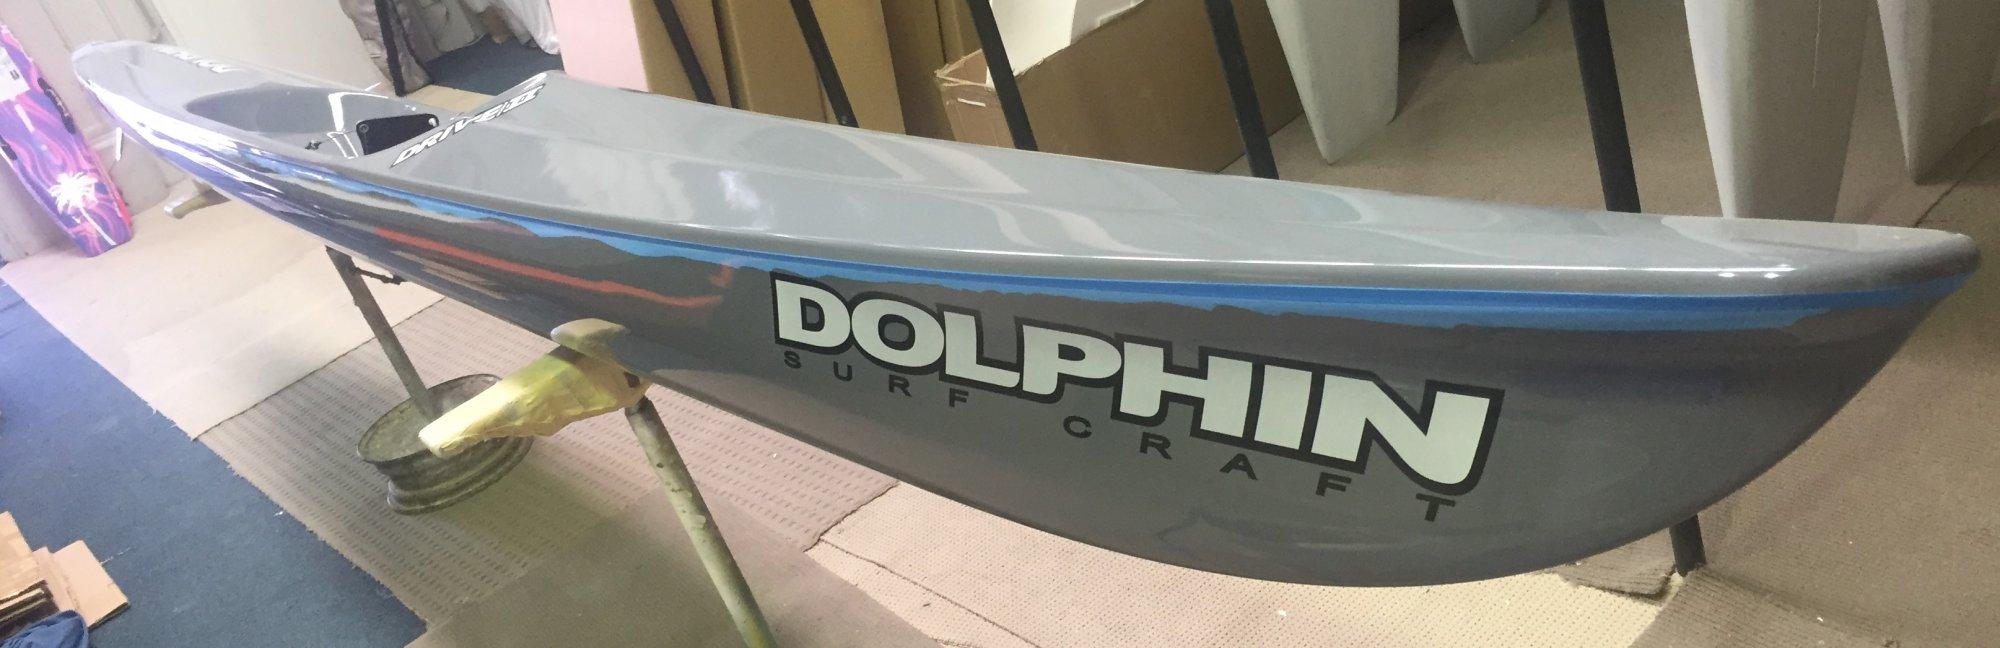 Dolphin Adjustable Drive II Surf Ski 19' - 985